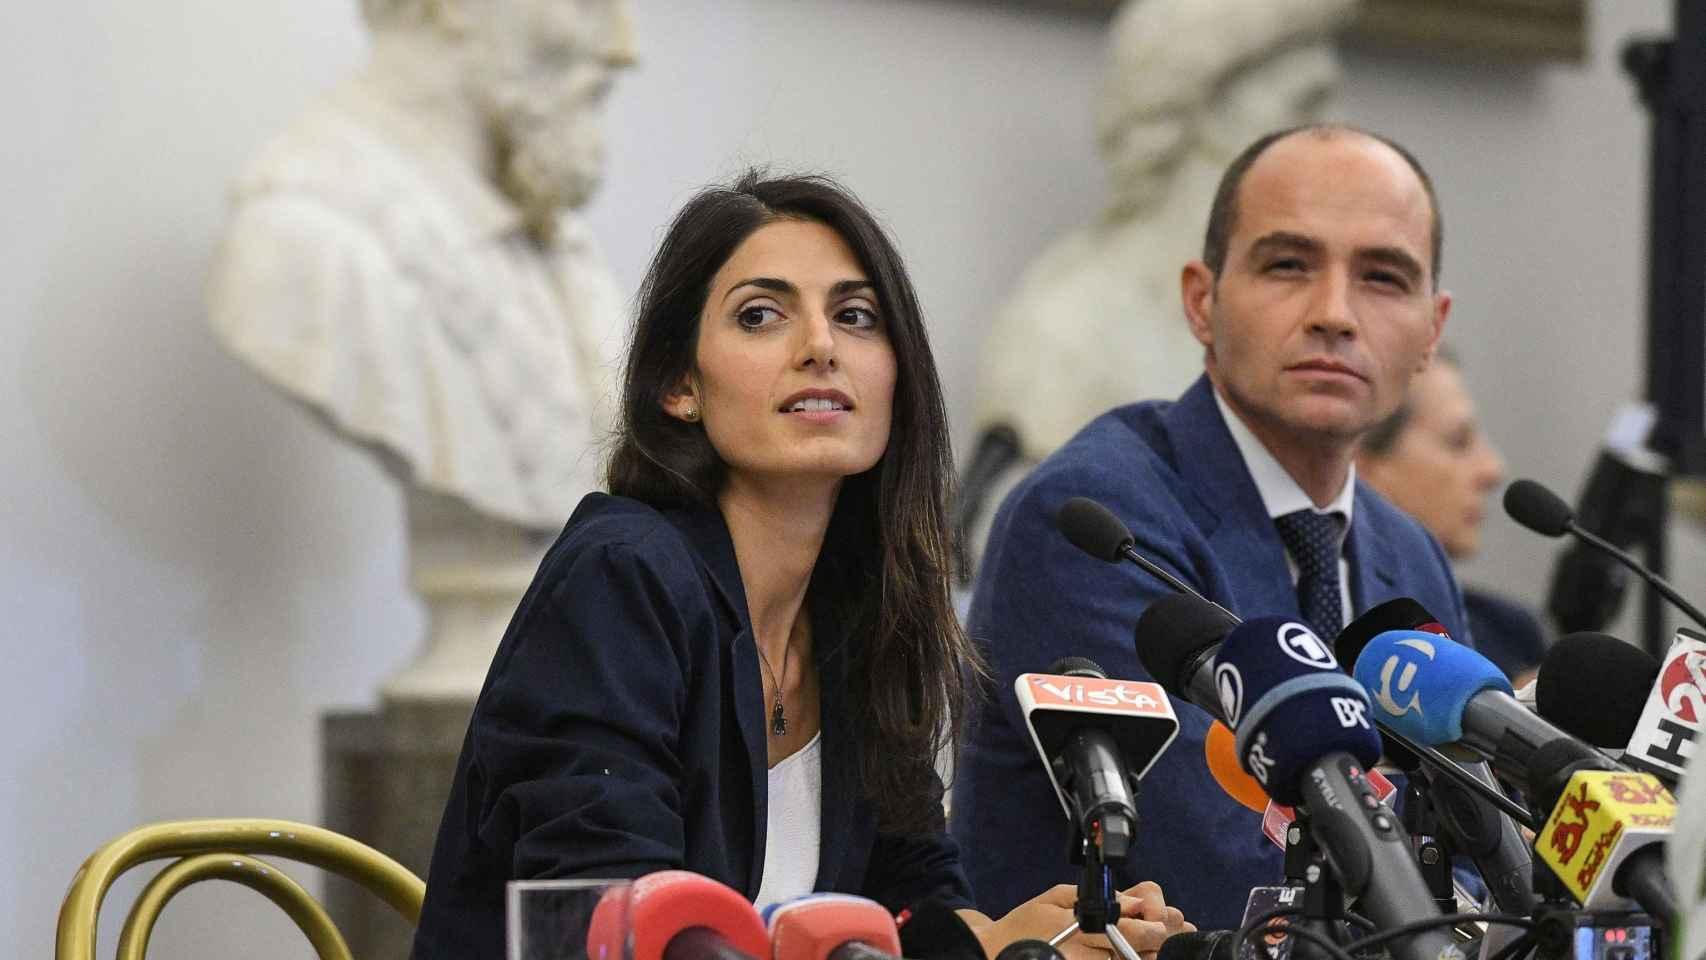 Virginia Raggi con su jefe de gabinete, Daniele Frongia.